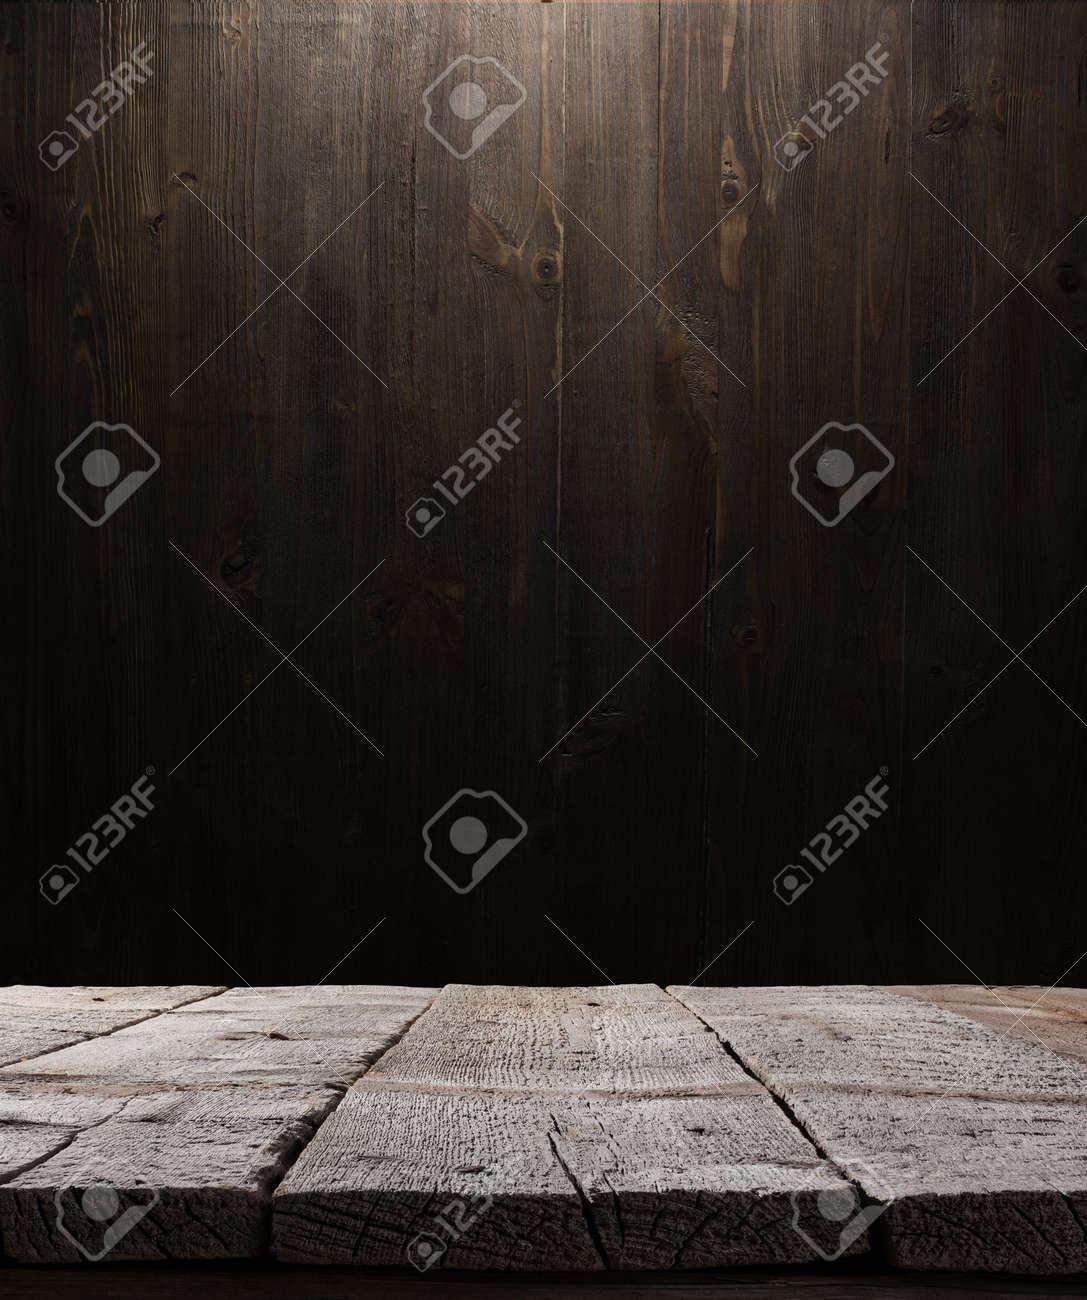 dark wooden background texture. Wood shelf, grunge industrial interior with light bulb - 43458430